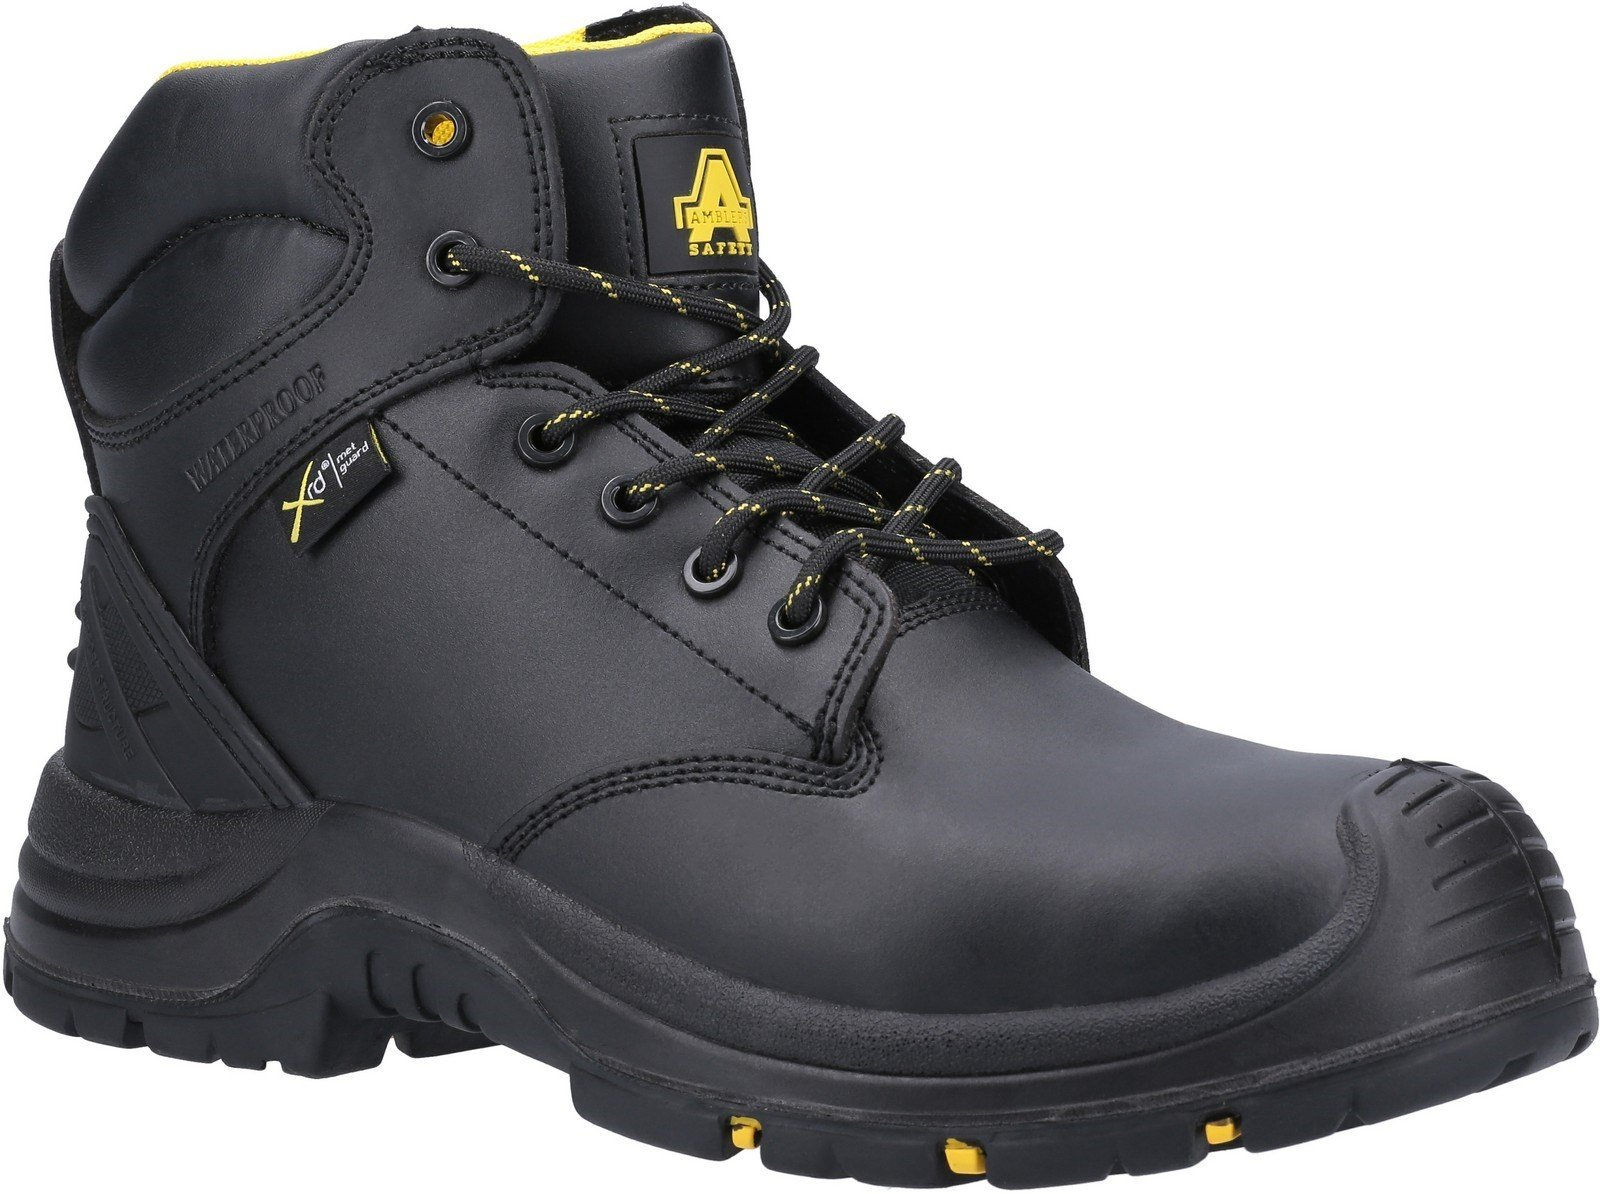 Amblers Unisex Safety Wrekin Lace Up Metal Waterproof Boot Black 29736 - Black 4